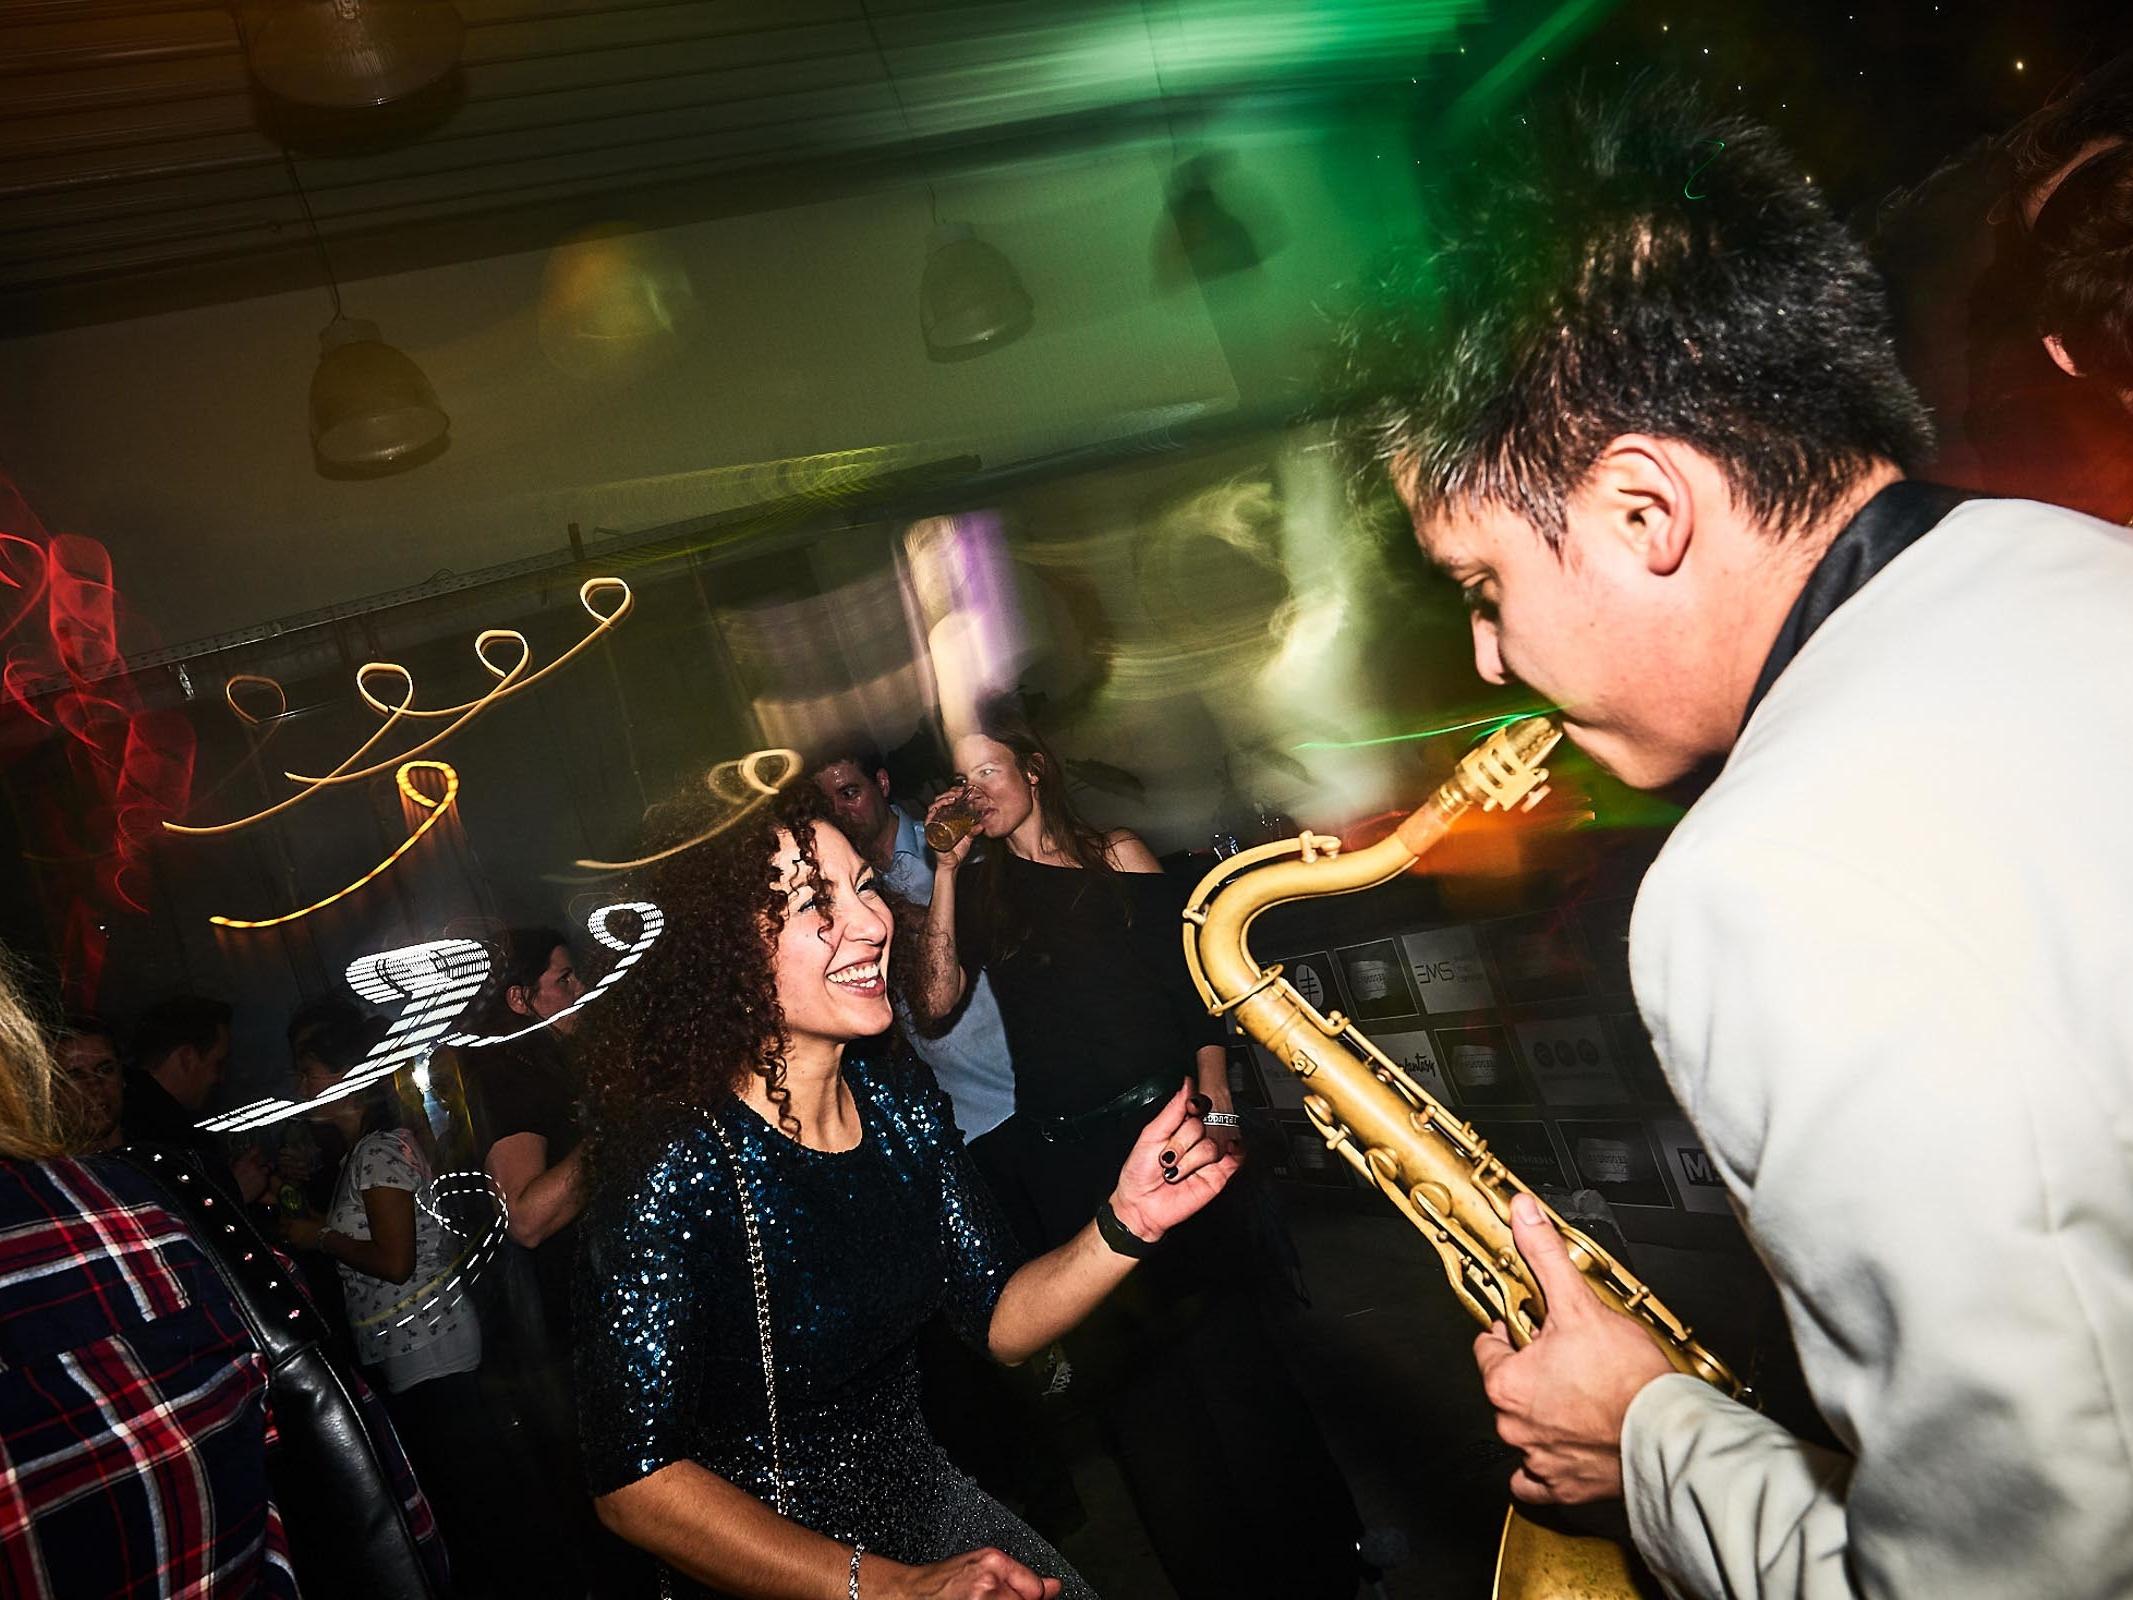 Saxophonist | Hannover | Party | Dinner | Empfang | Lounge | DJ | Plus | Livemusik | Liveband | Musiker | Künstler | Swing | Loungeband | Popband | Saxophon | Combo | Hochzeit | Messe | Firmenfeier | Charity | Gala | Party | Buchen